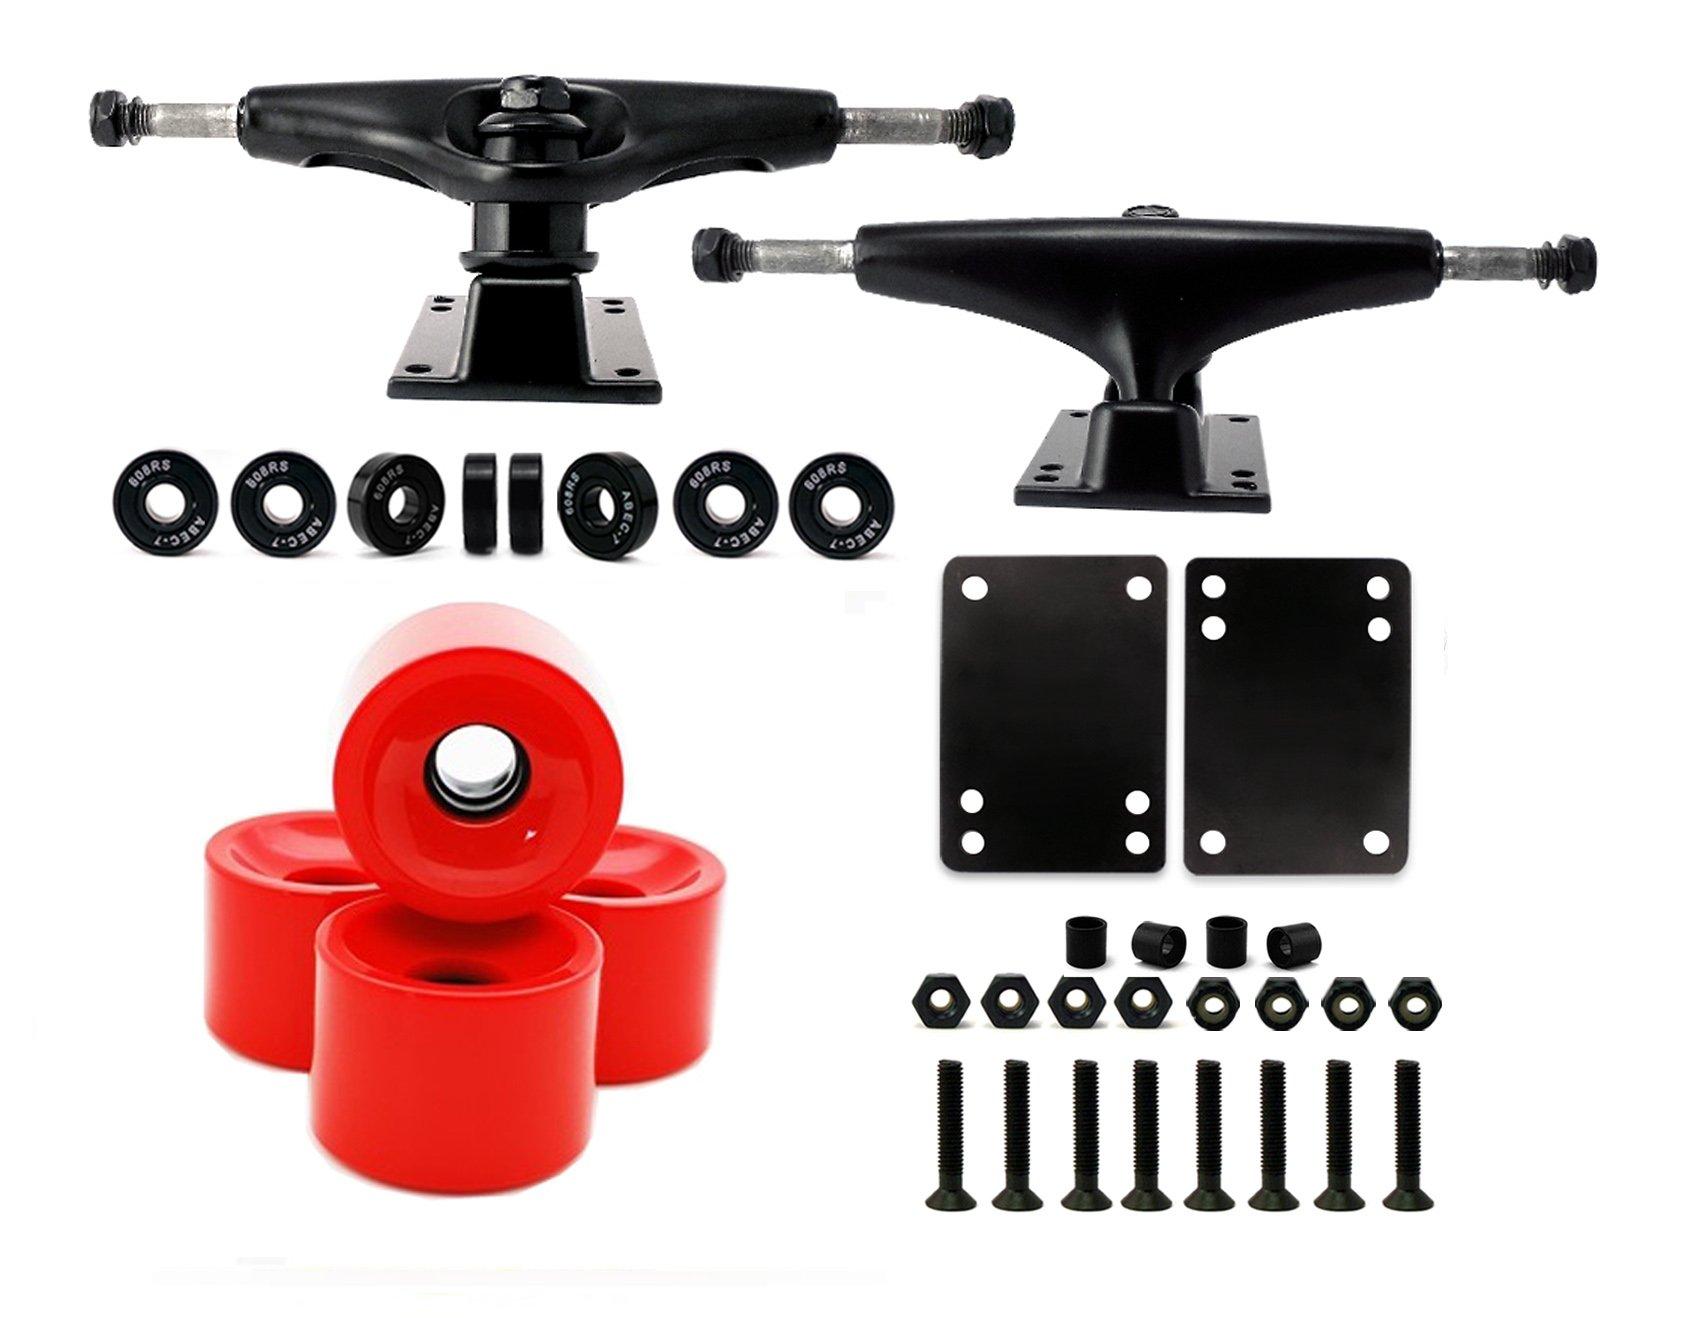 VJ Skateboard Truck and Wheel, 5.0 Skateboard Trucks (Black) w/Skateboard Crusier Wheel 60mm, Skateboard Bearings, Skateboard Screws, Skateboard Riser Pads (red) by VJ